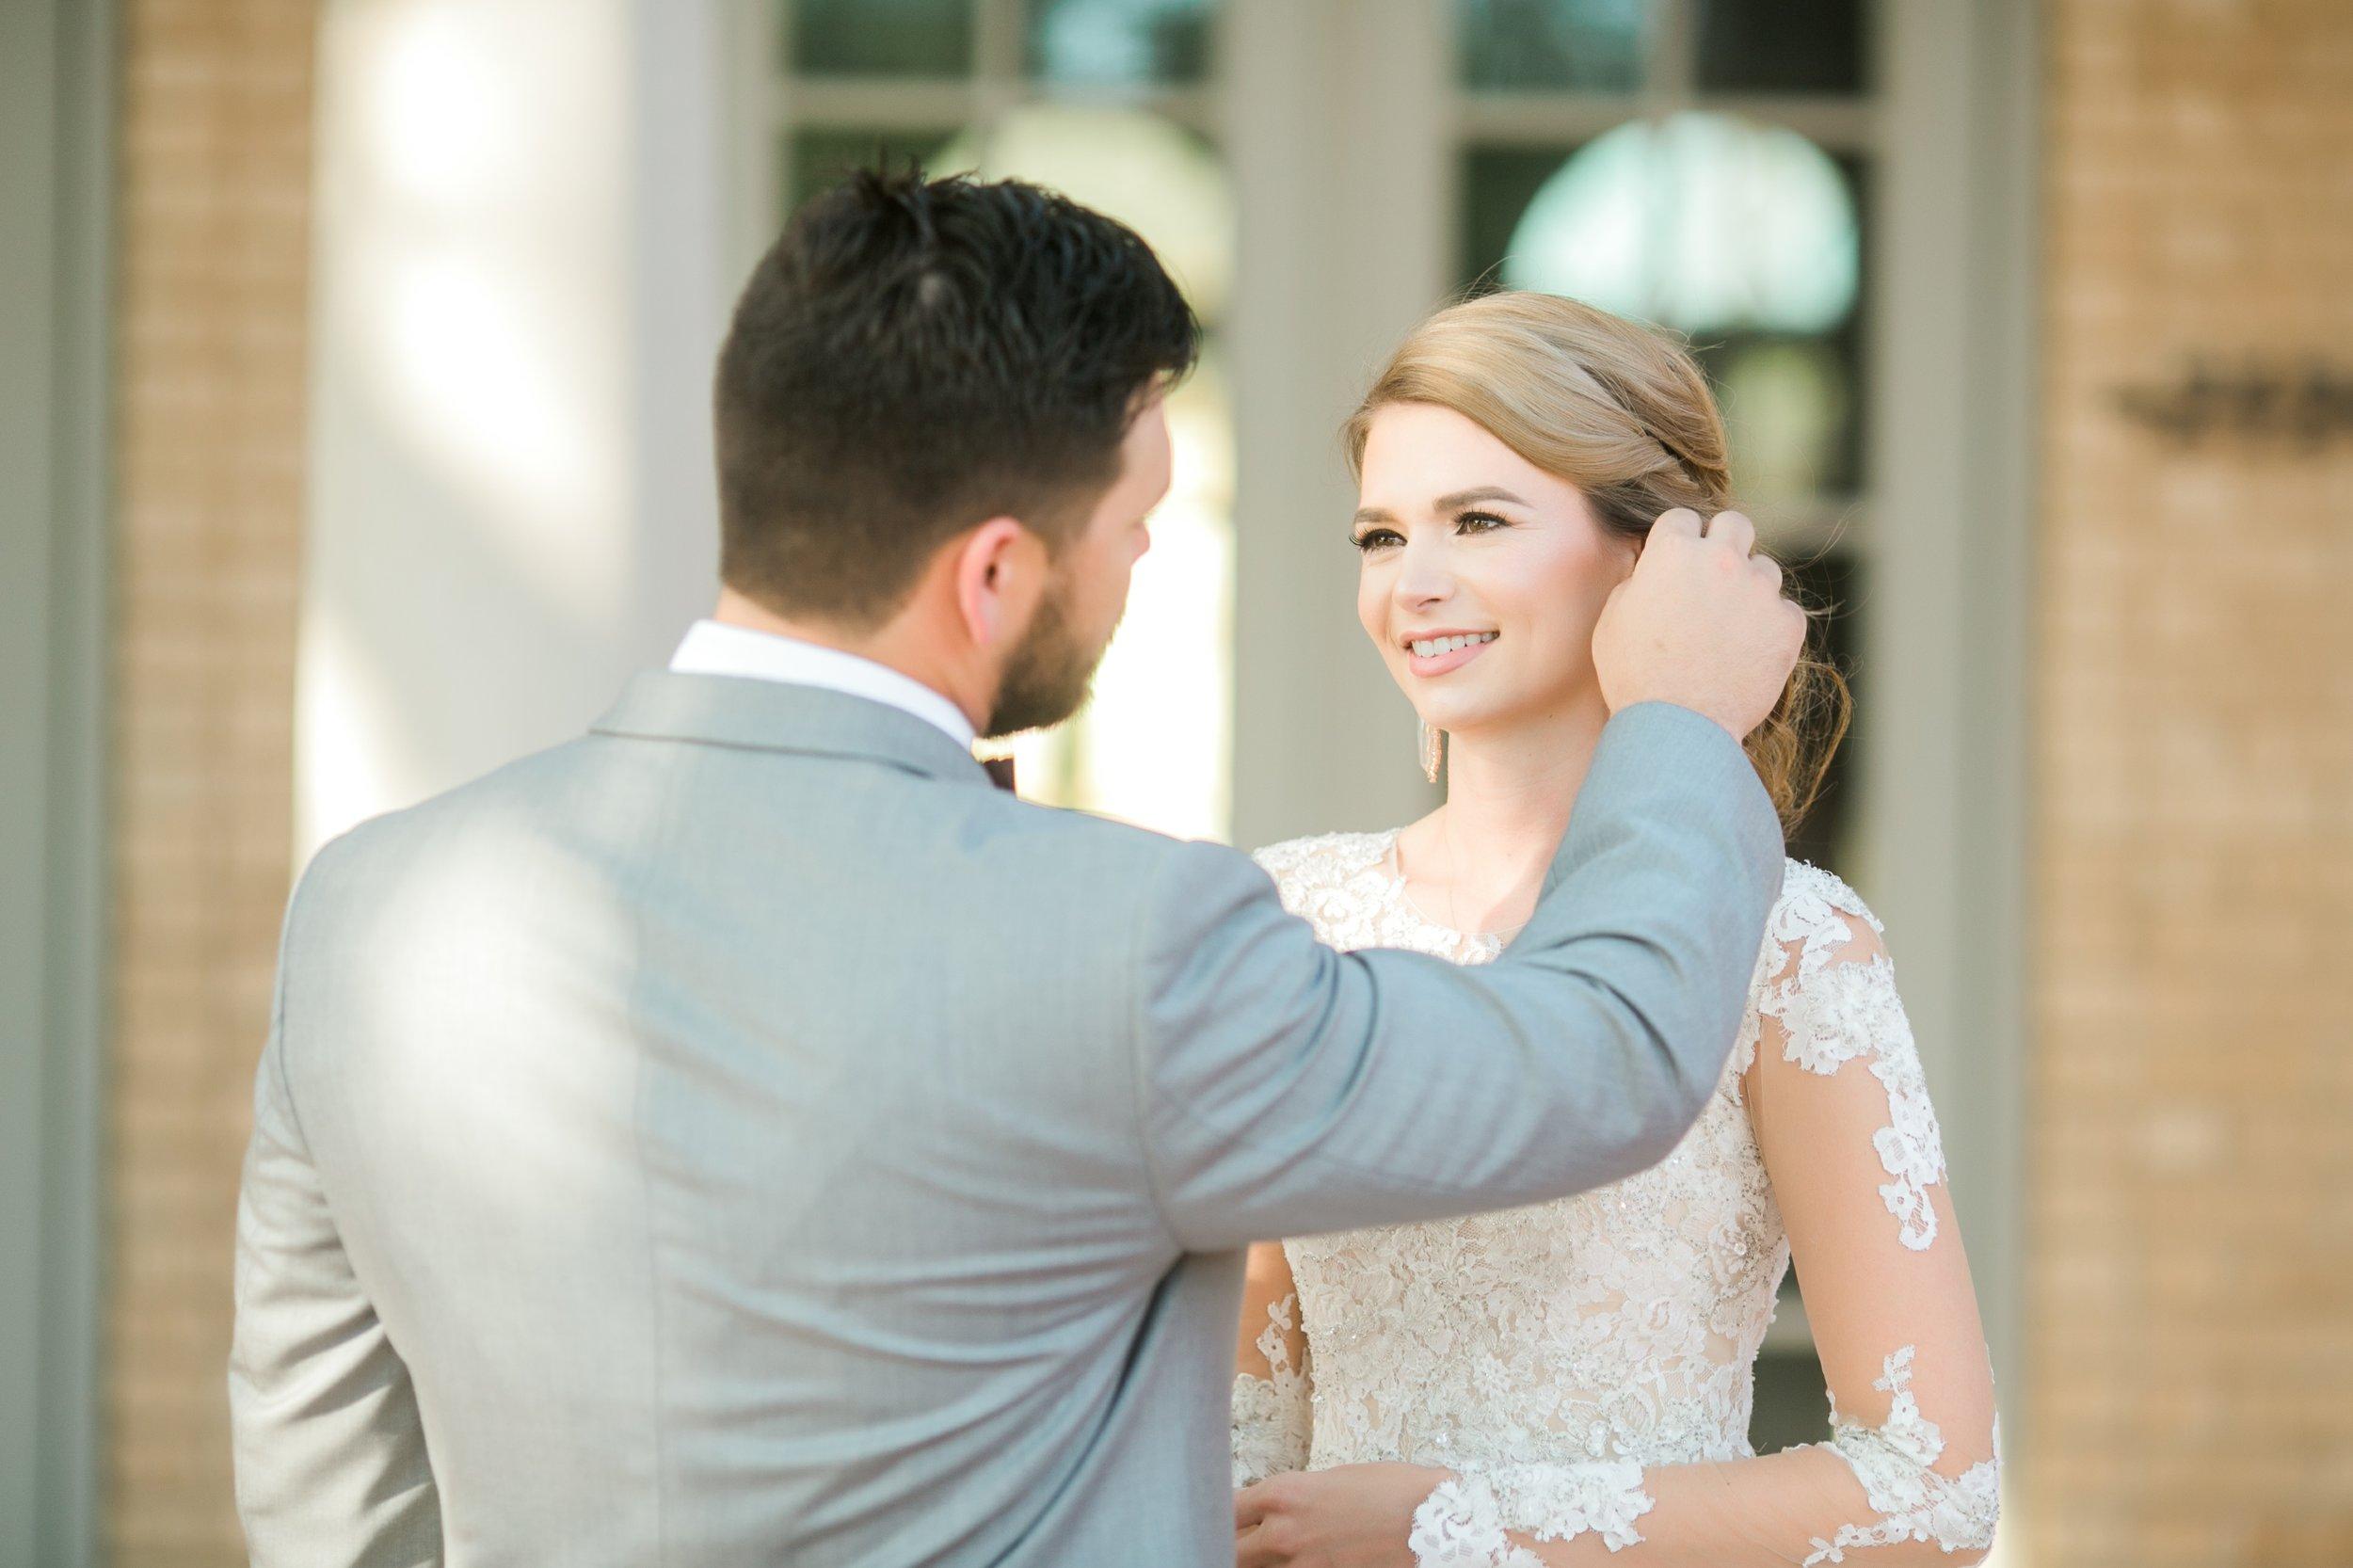 Roberson-Wedding-The-Forum-Lauren-Pinson-Wedding-Photography-Wichita-Falls-Texas-029.jpg